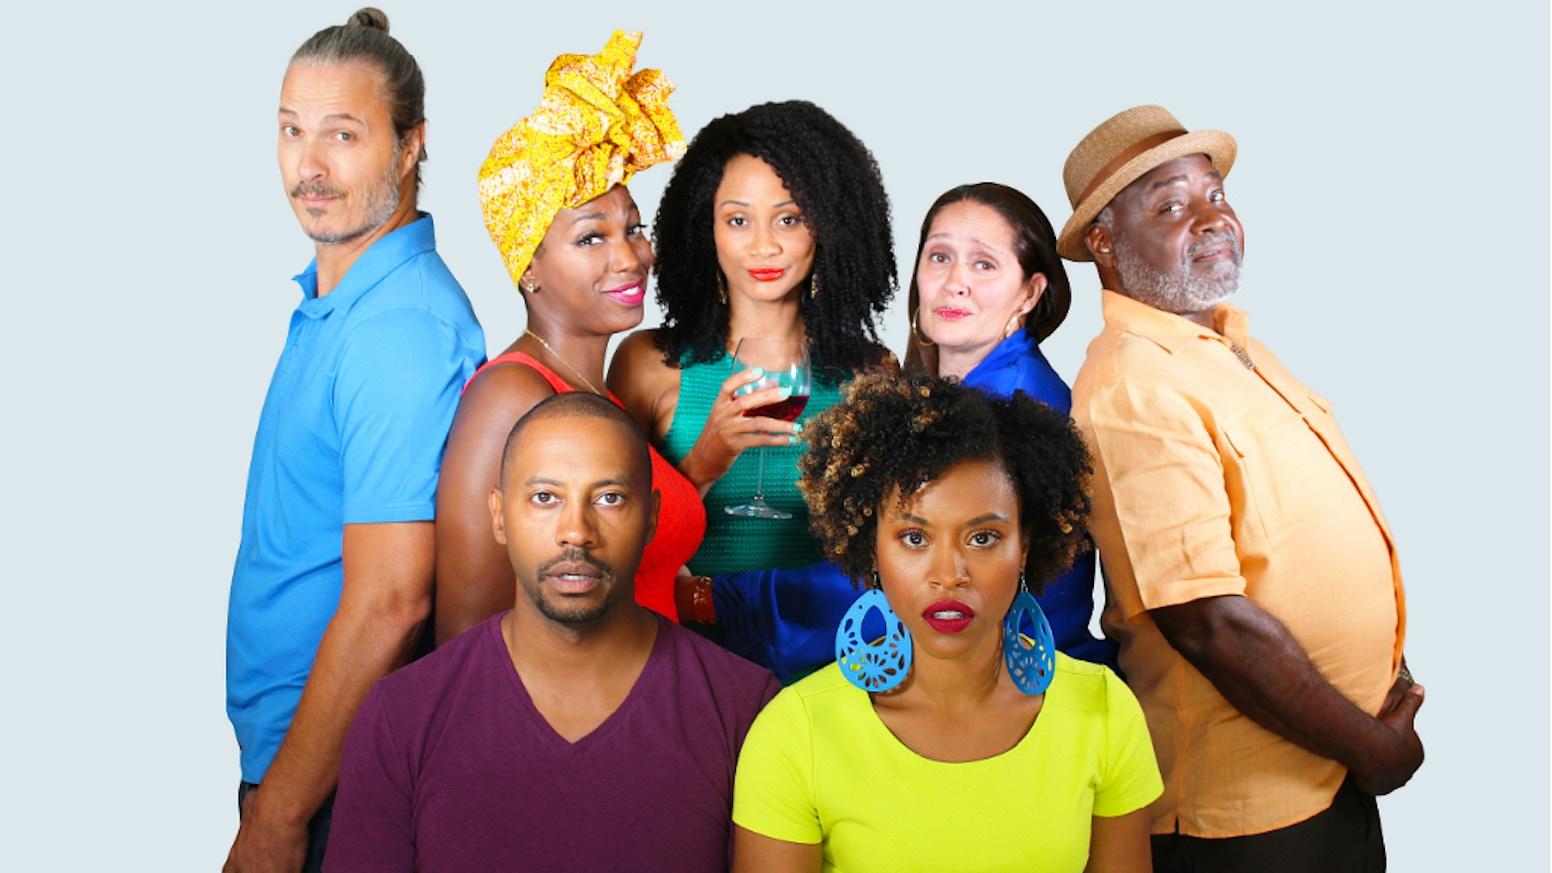 Funny Married Stuff by Lony'e Perrine » Season 2: Episode 1